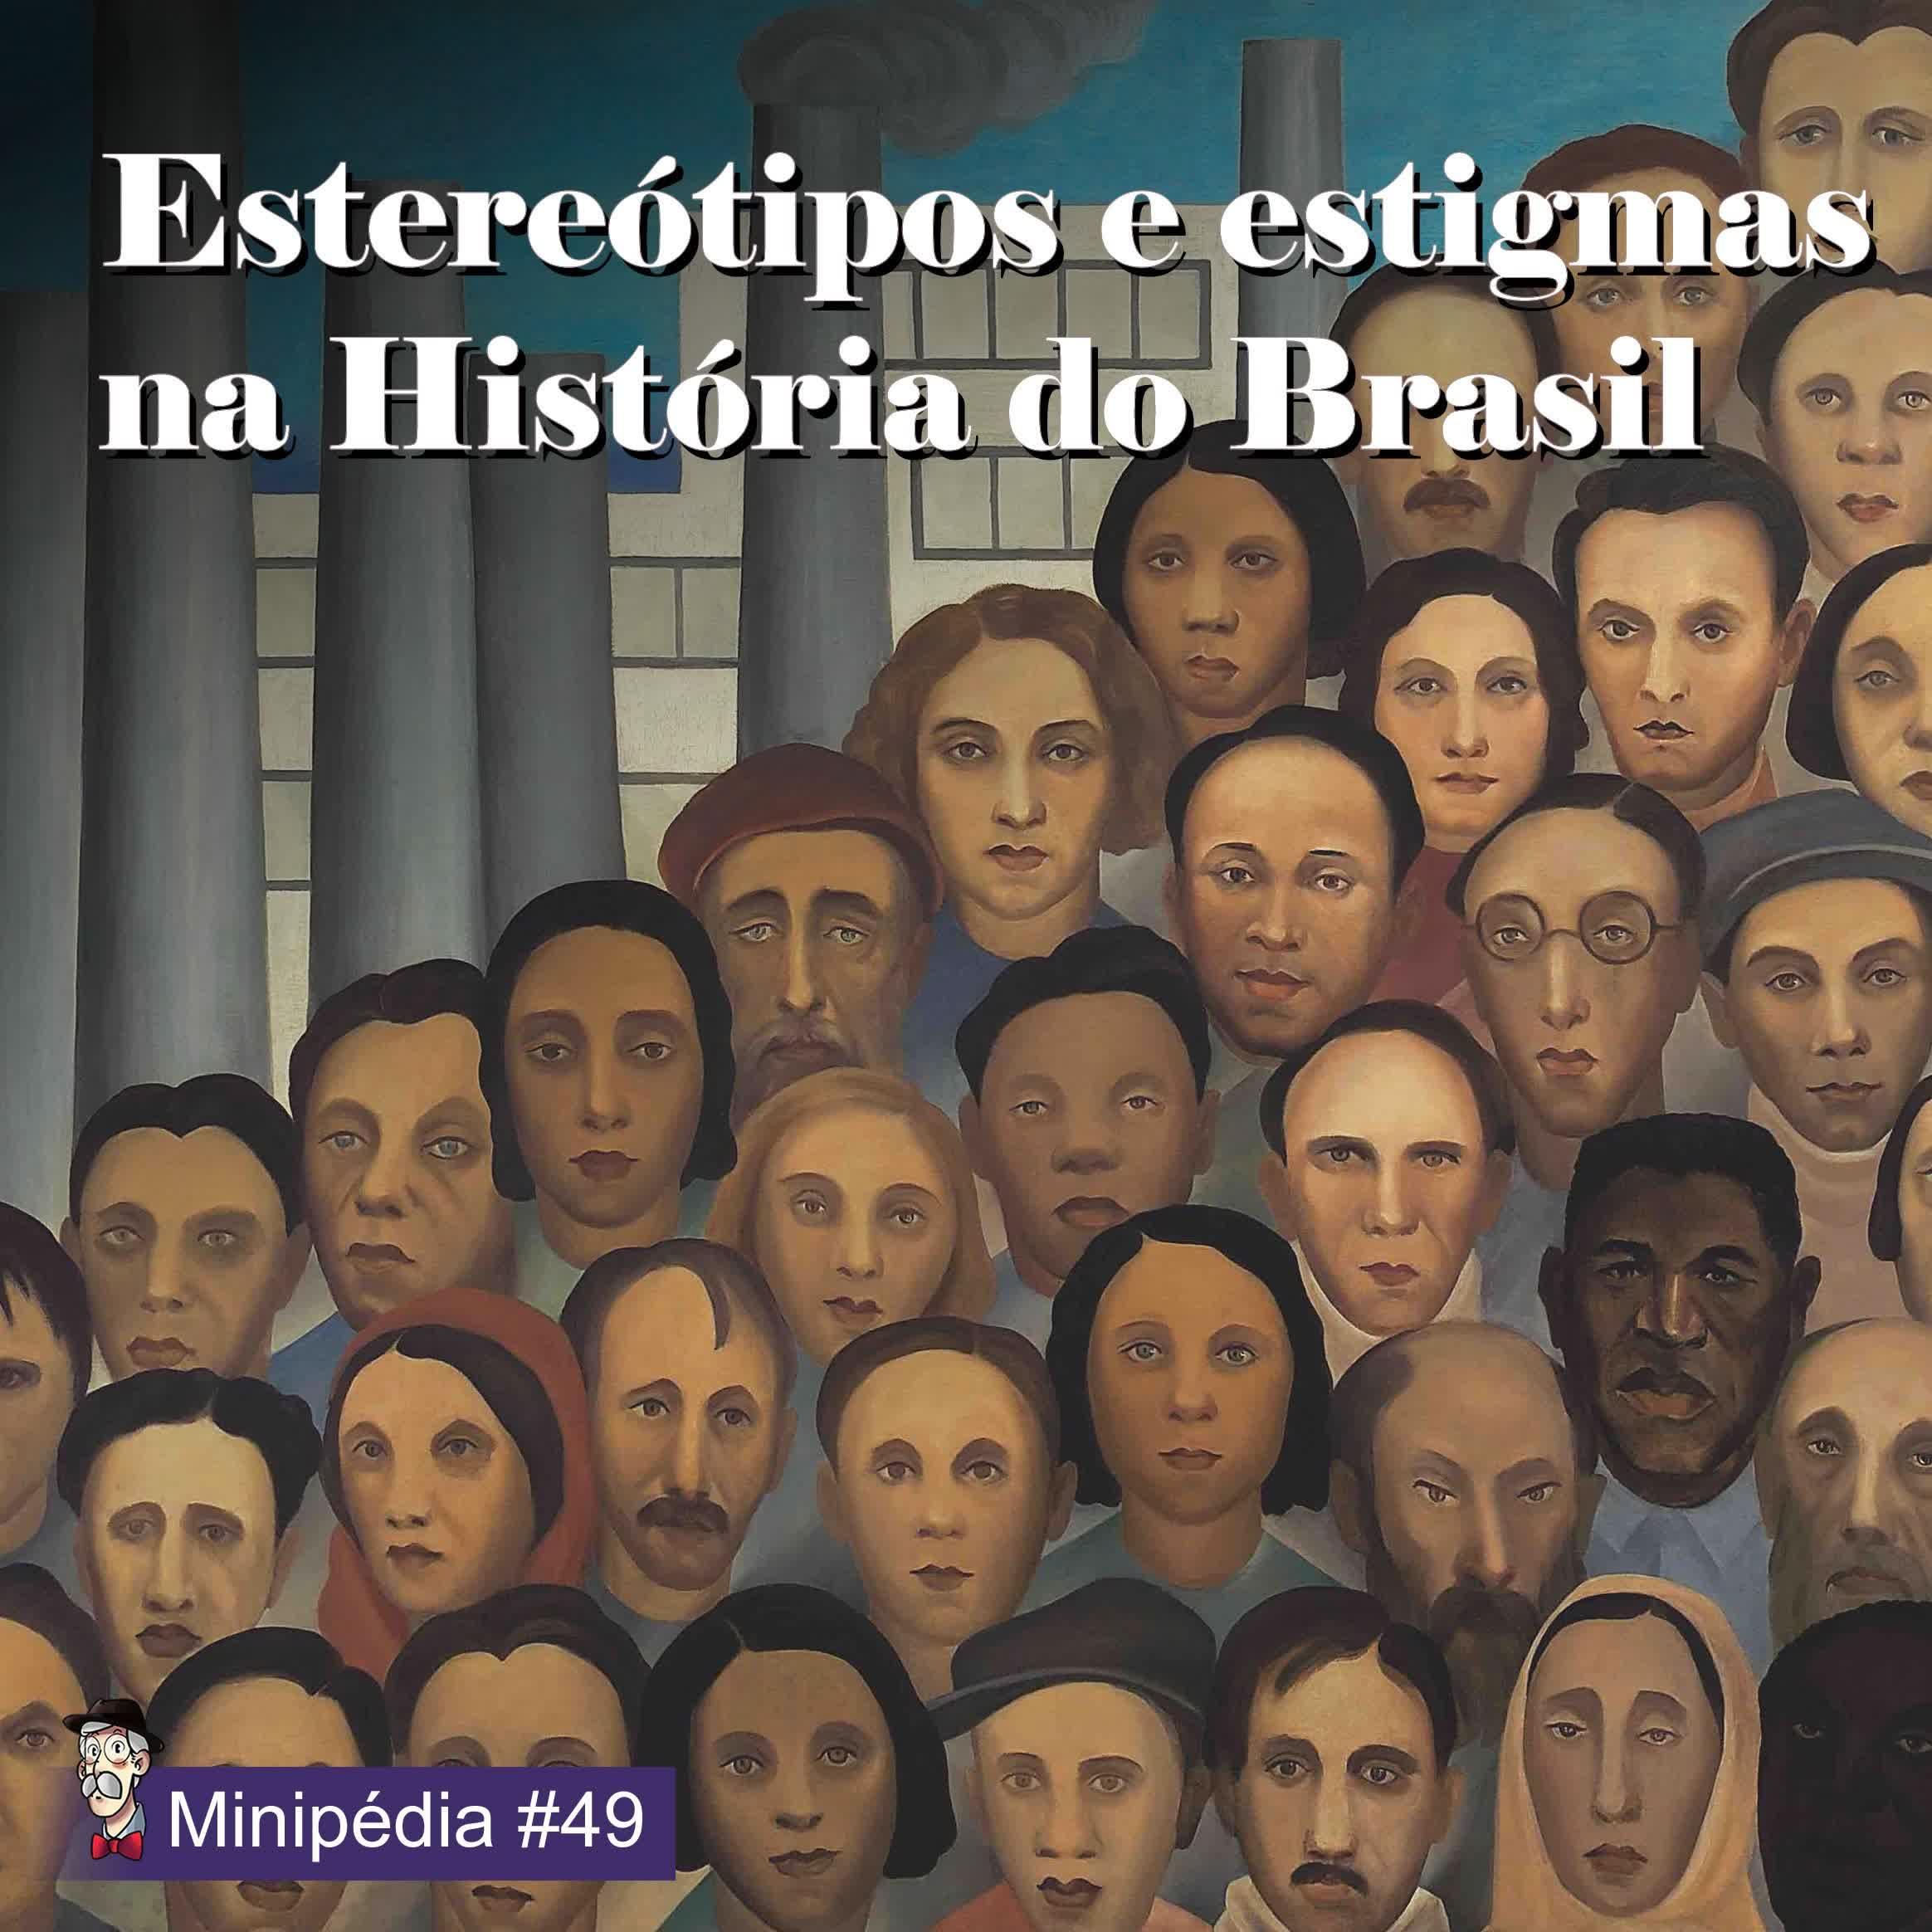 [Minipédia] Estereótipos e estigmas na História do Brasil